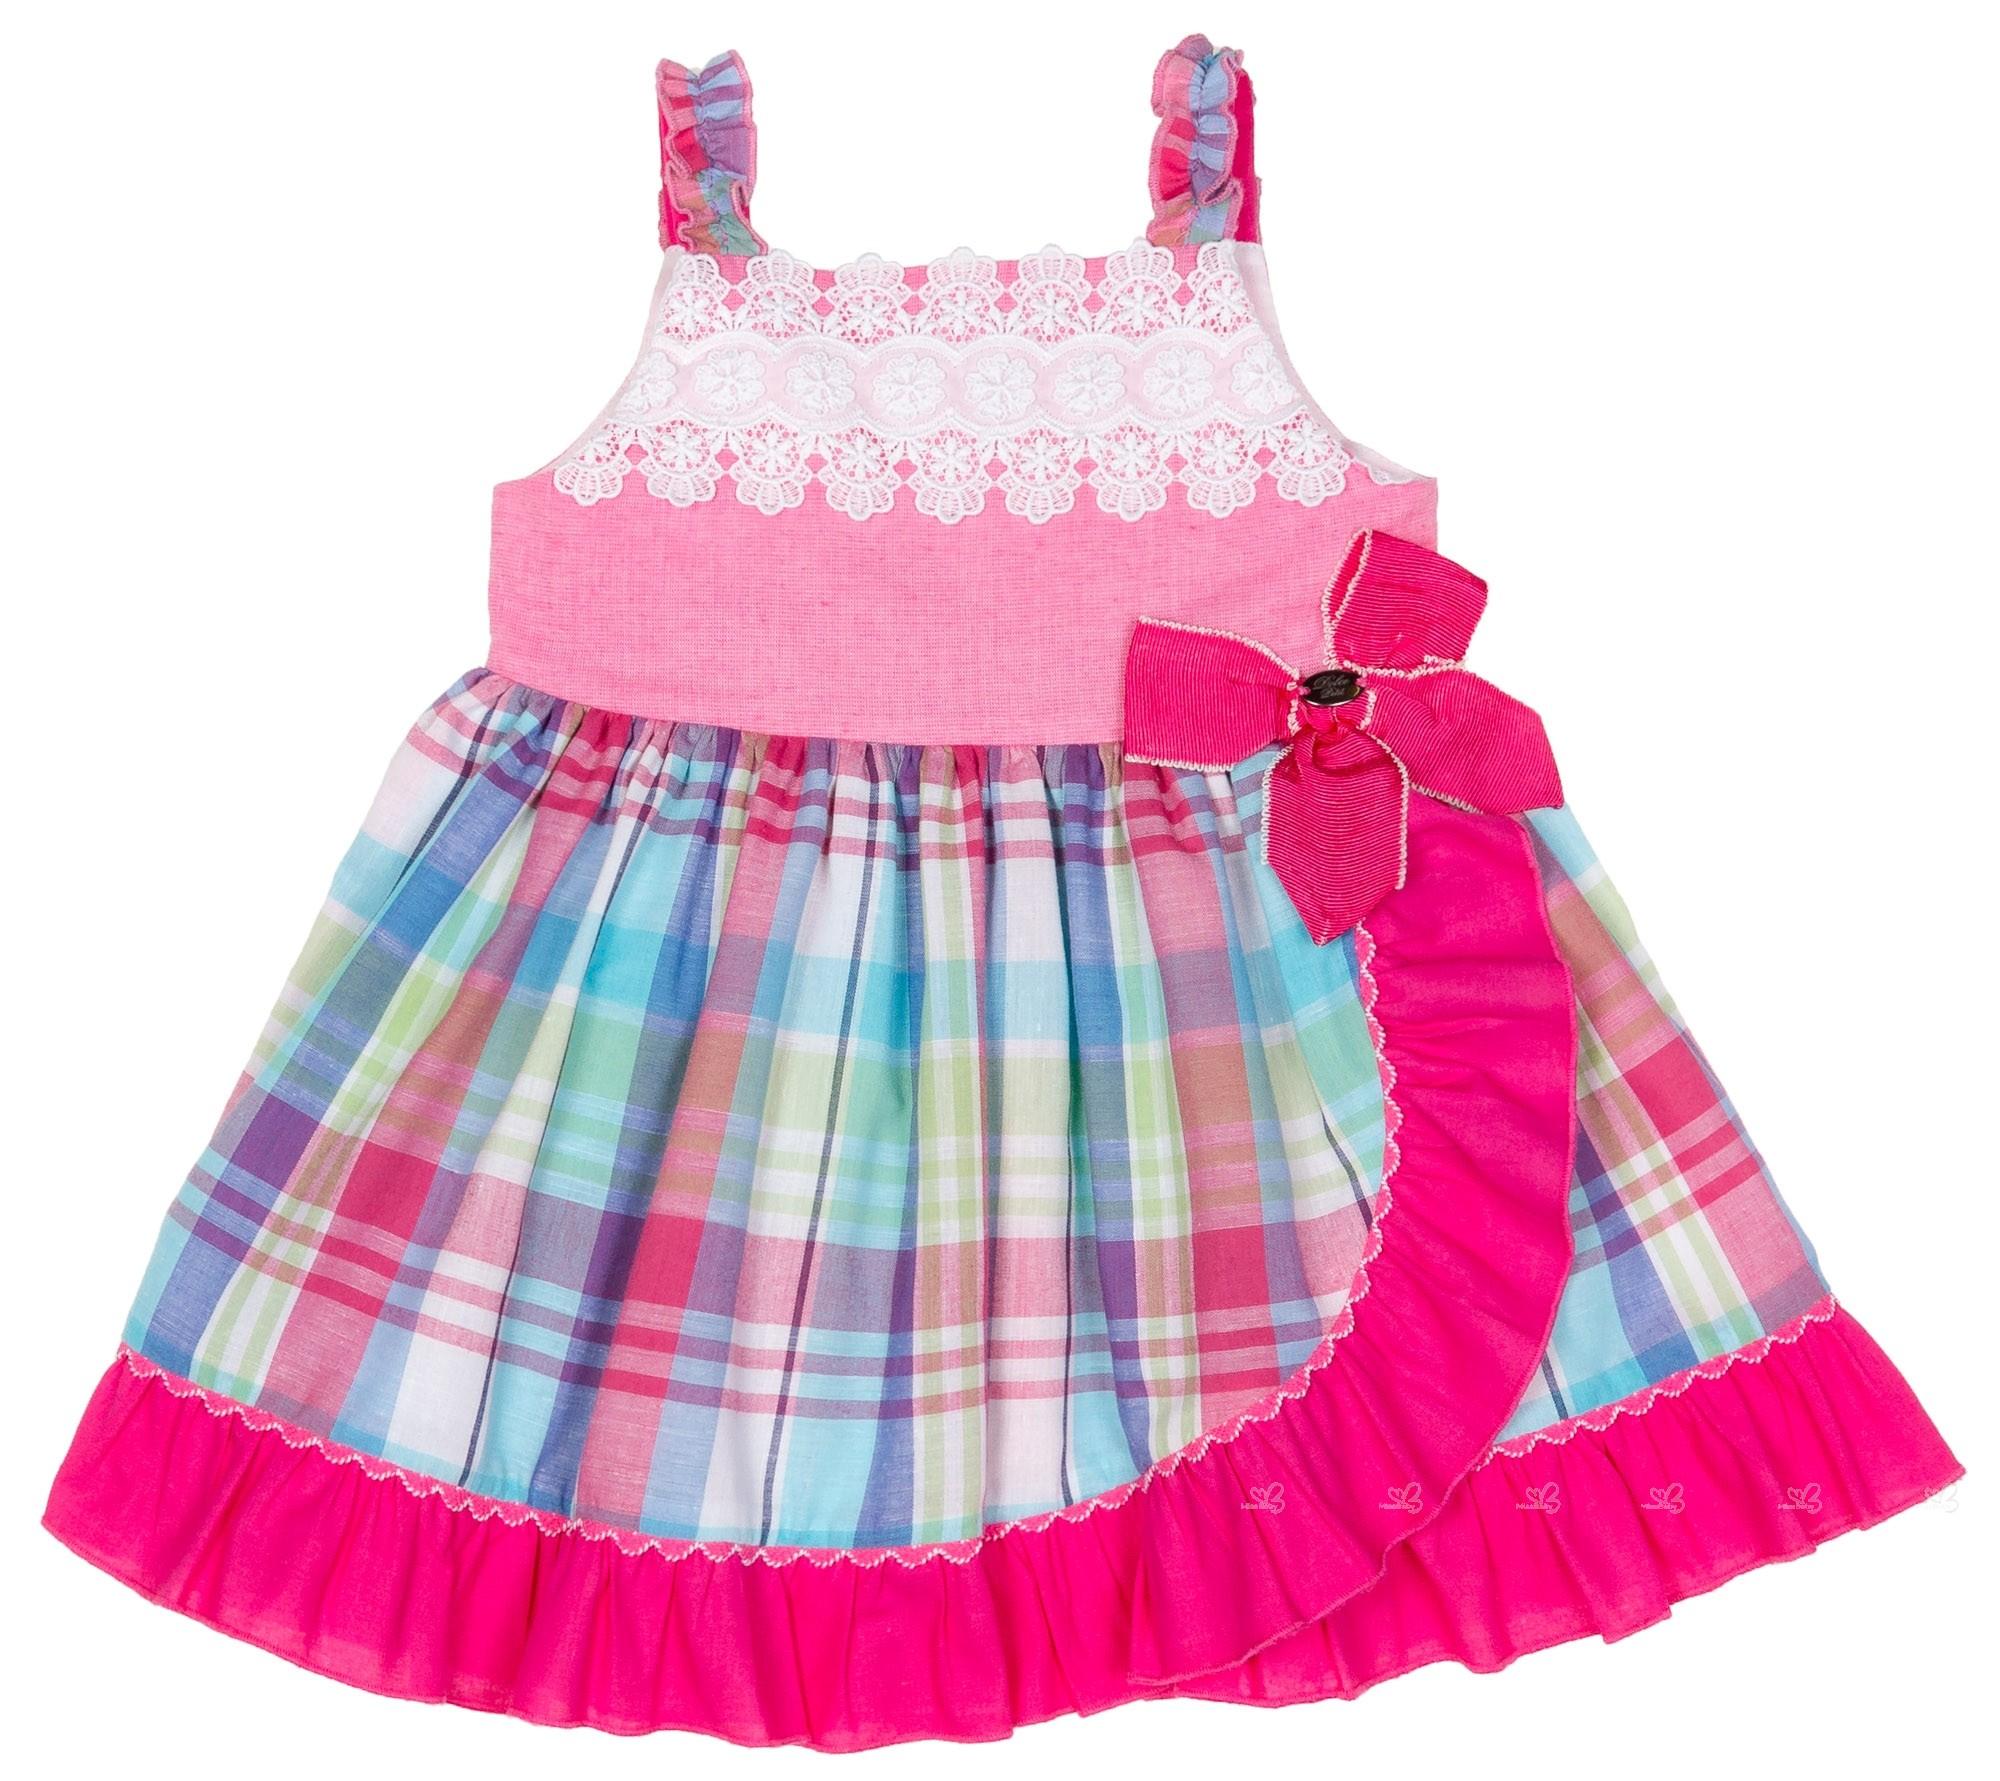 Famoso Vestidos De Fiesta Para Petite Composición - Ideas de Vestido ...